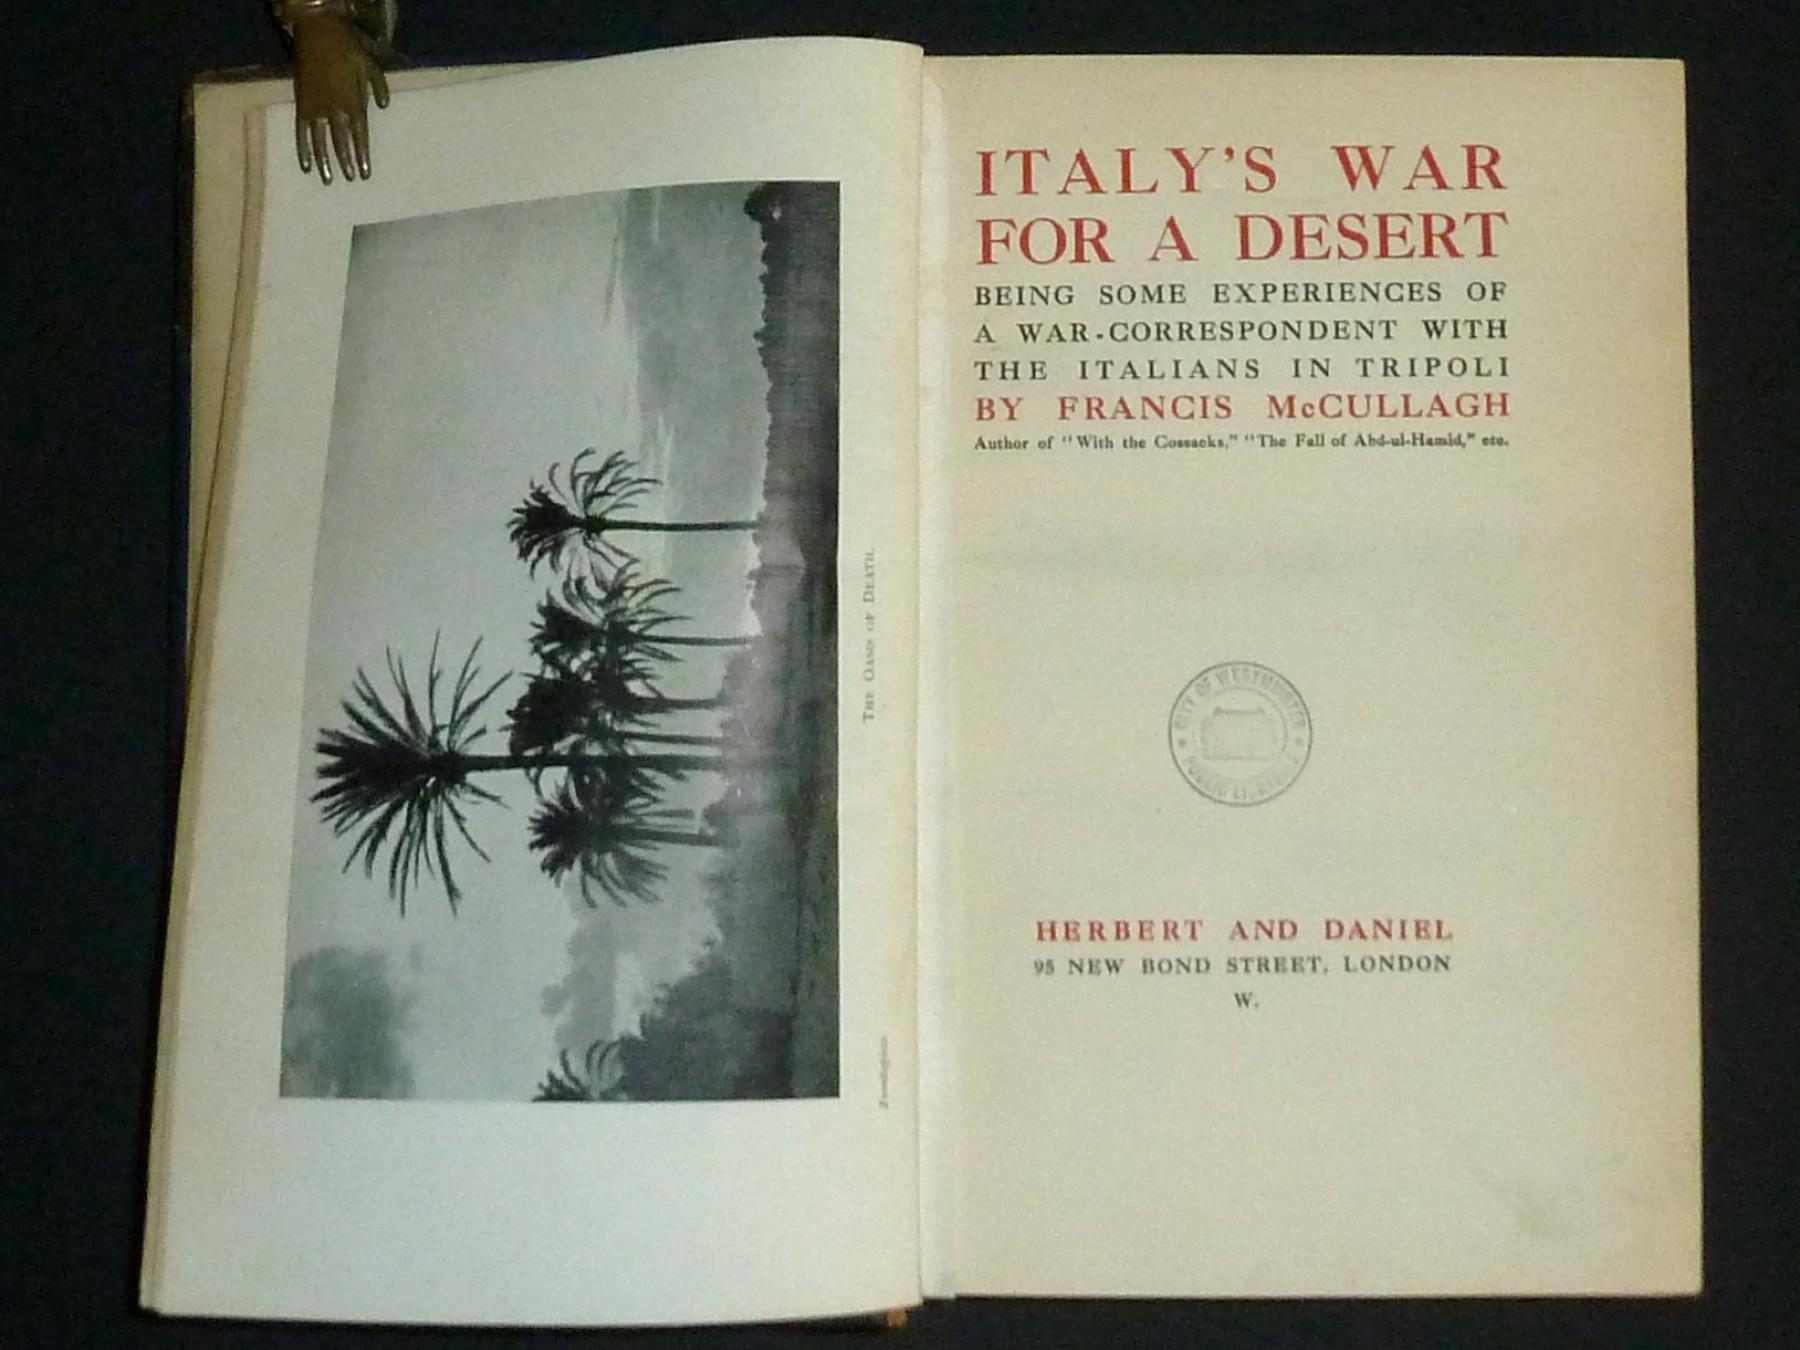 Italy's War for a Desert